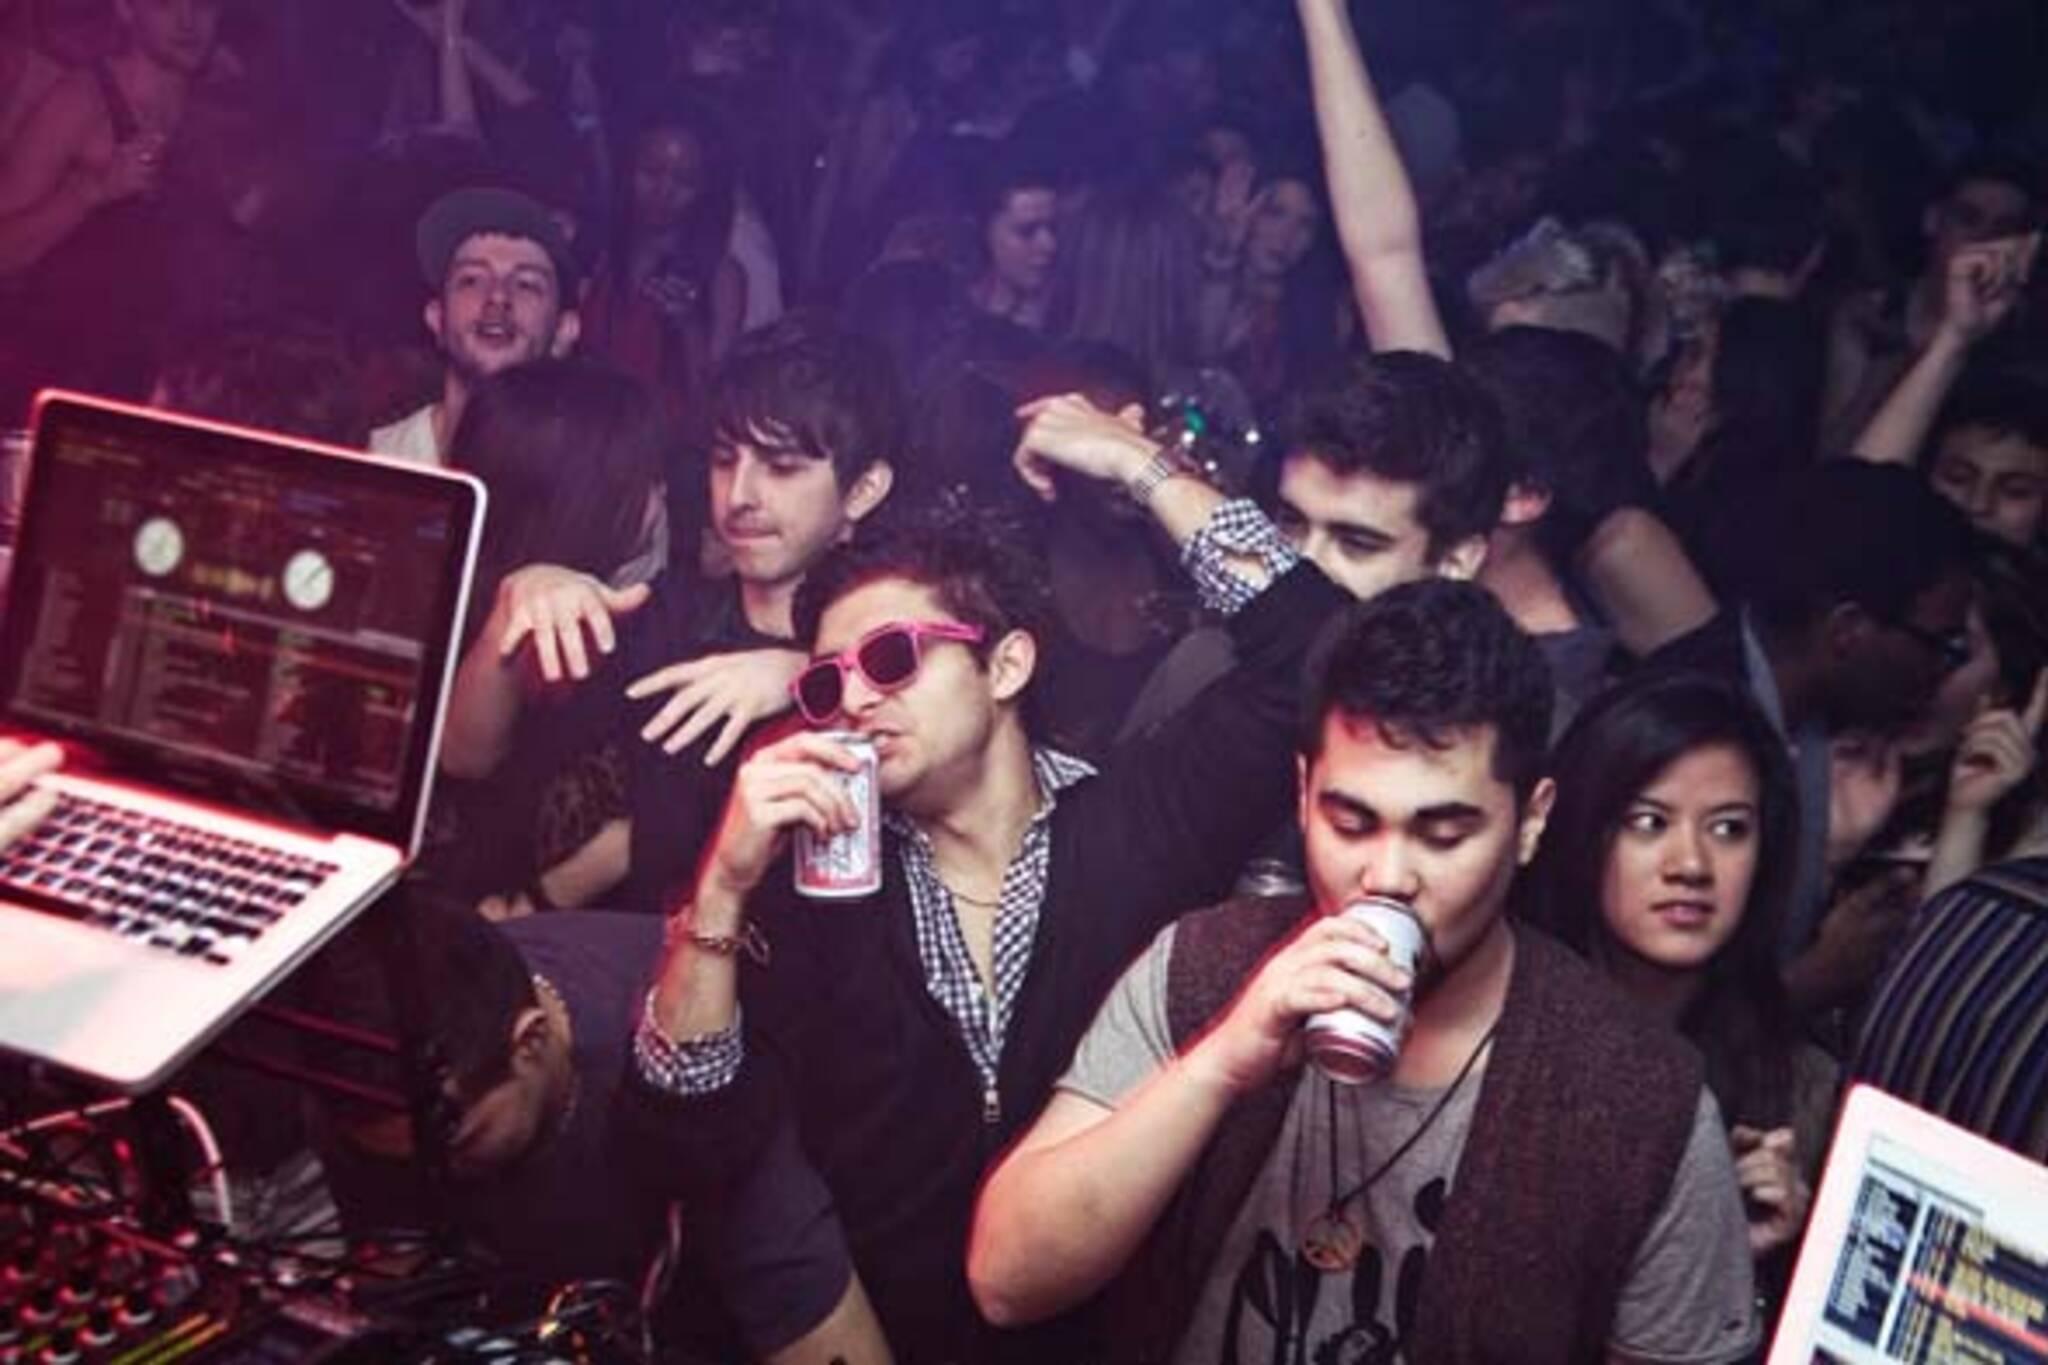 Toronto music promoters